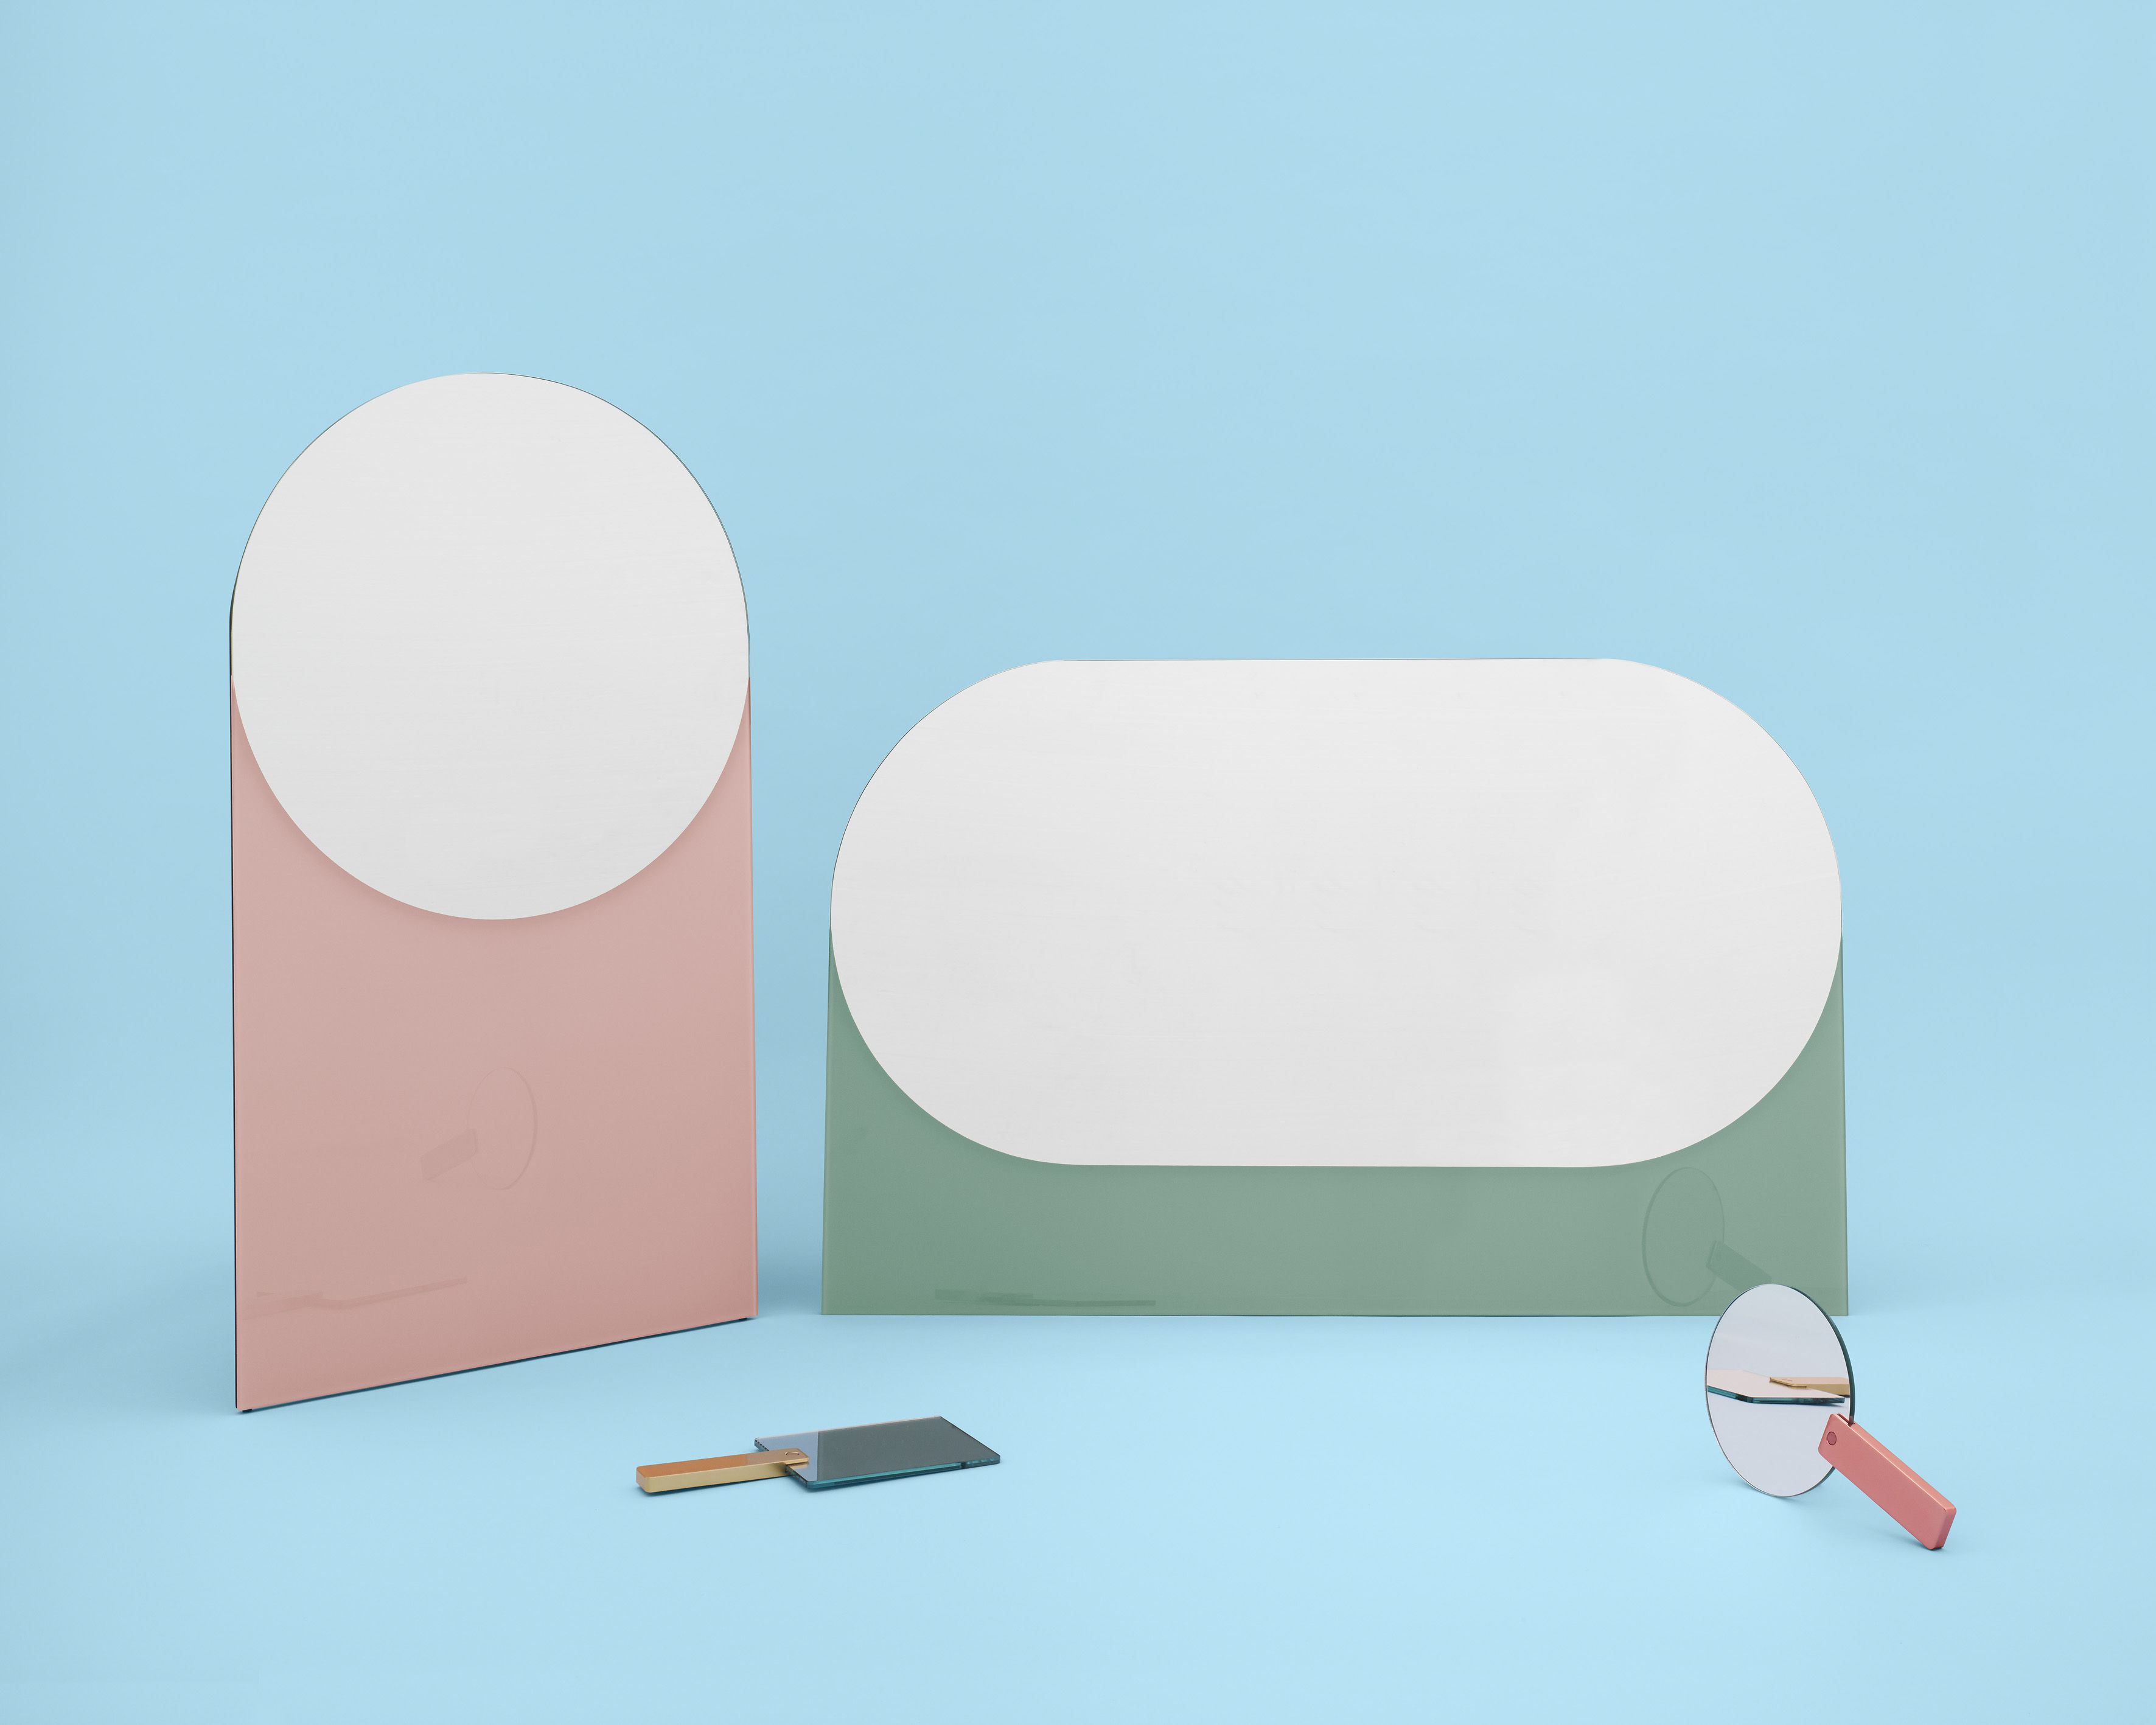 shape rund small l 50 x h 90 cm hay spiegel. Black Bedroom Furniture Sets. Home Design Ideas